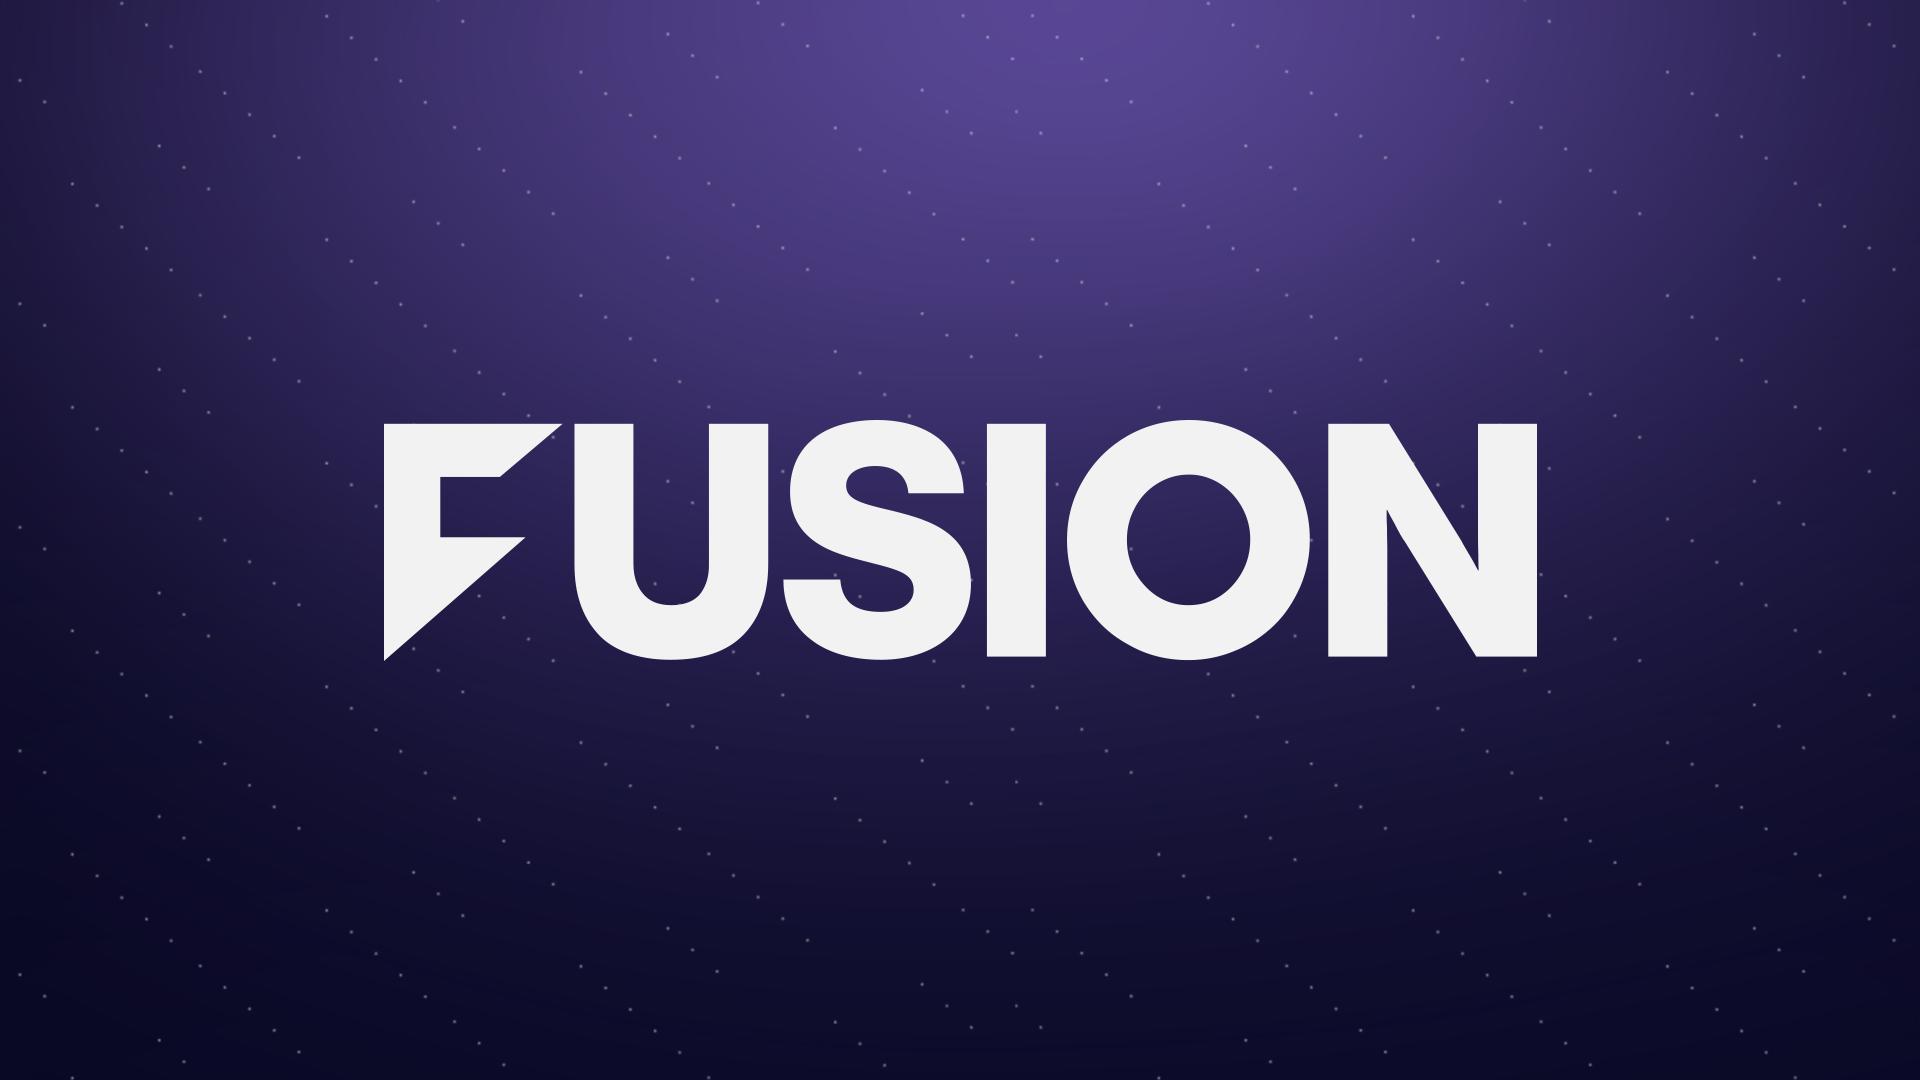 fusion-logo.png